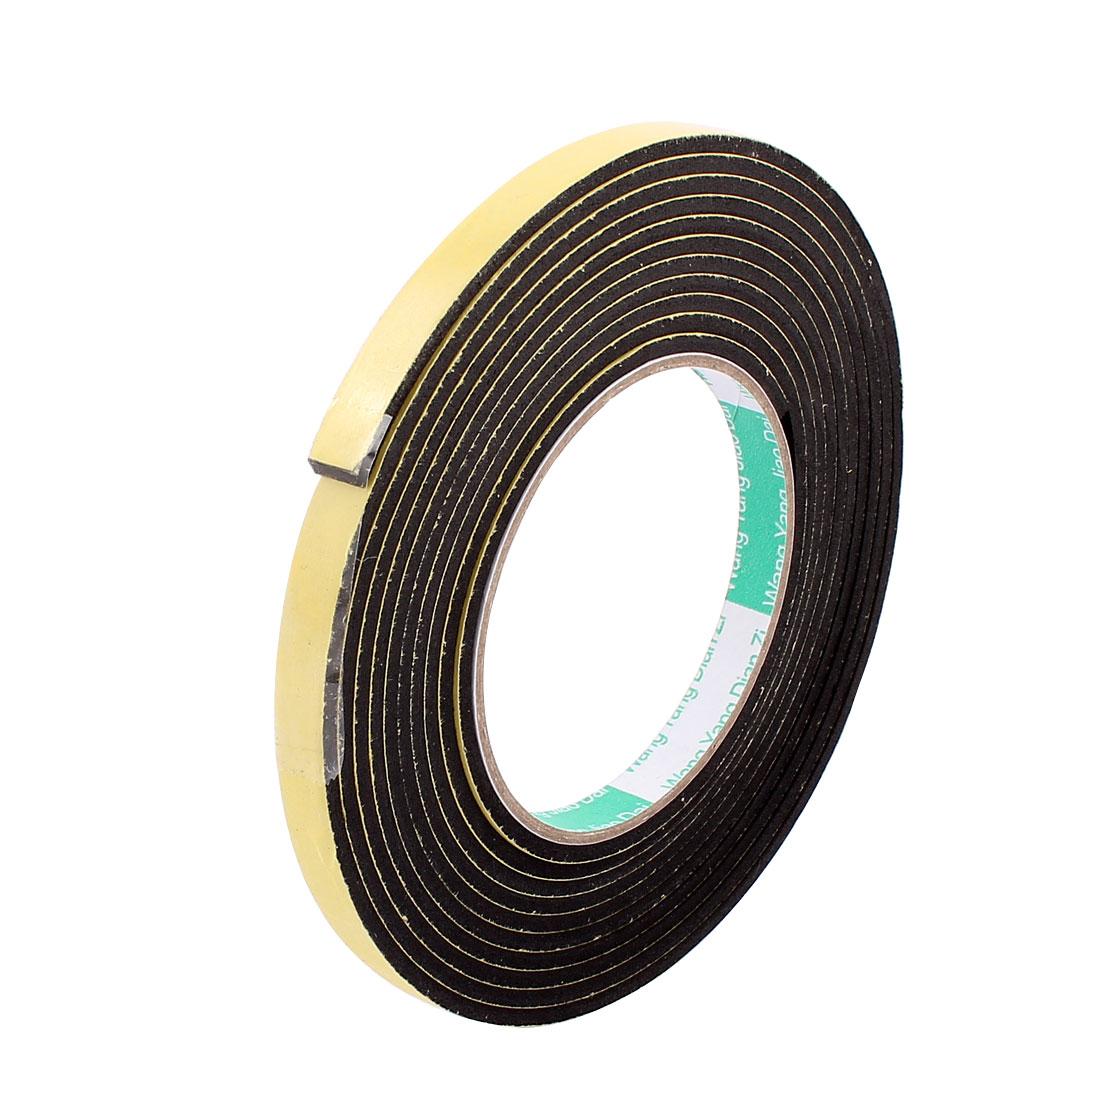 Black EVA 1CM Wide 4M Length 3MM Thick Single Sided Shockproof Sponge Tape